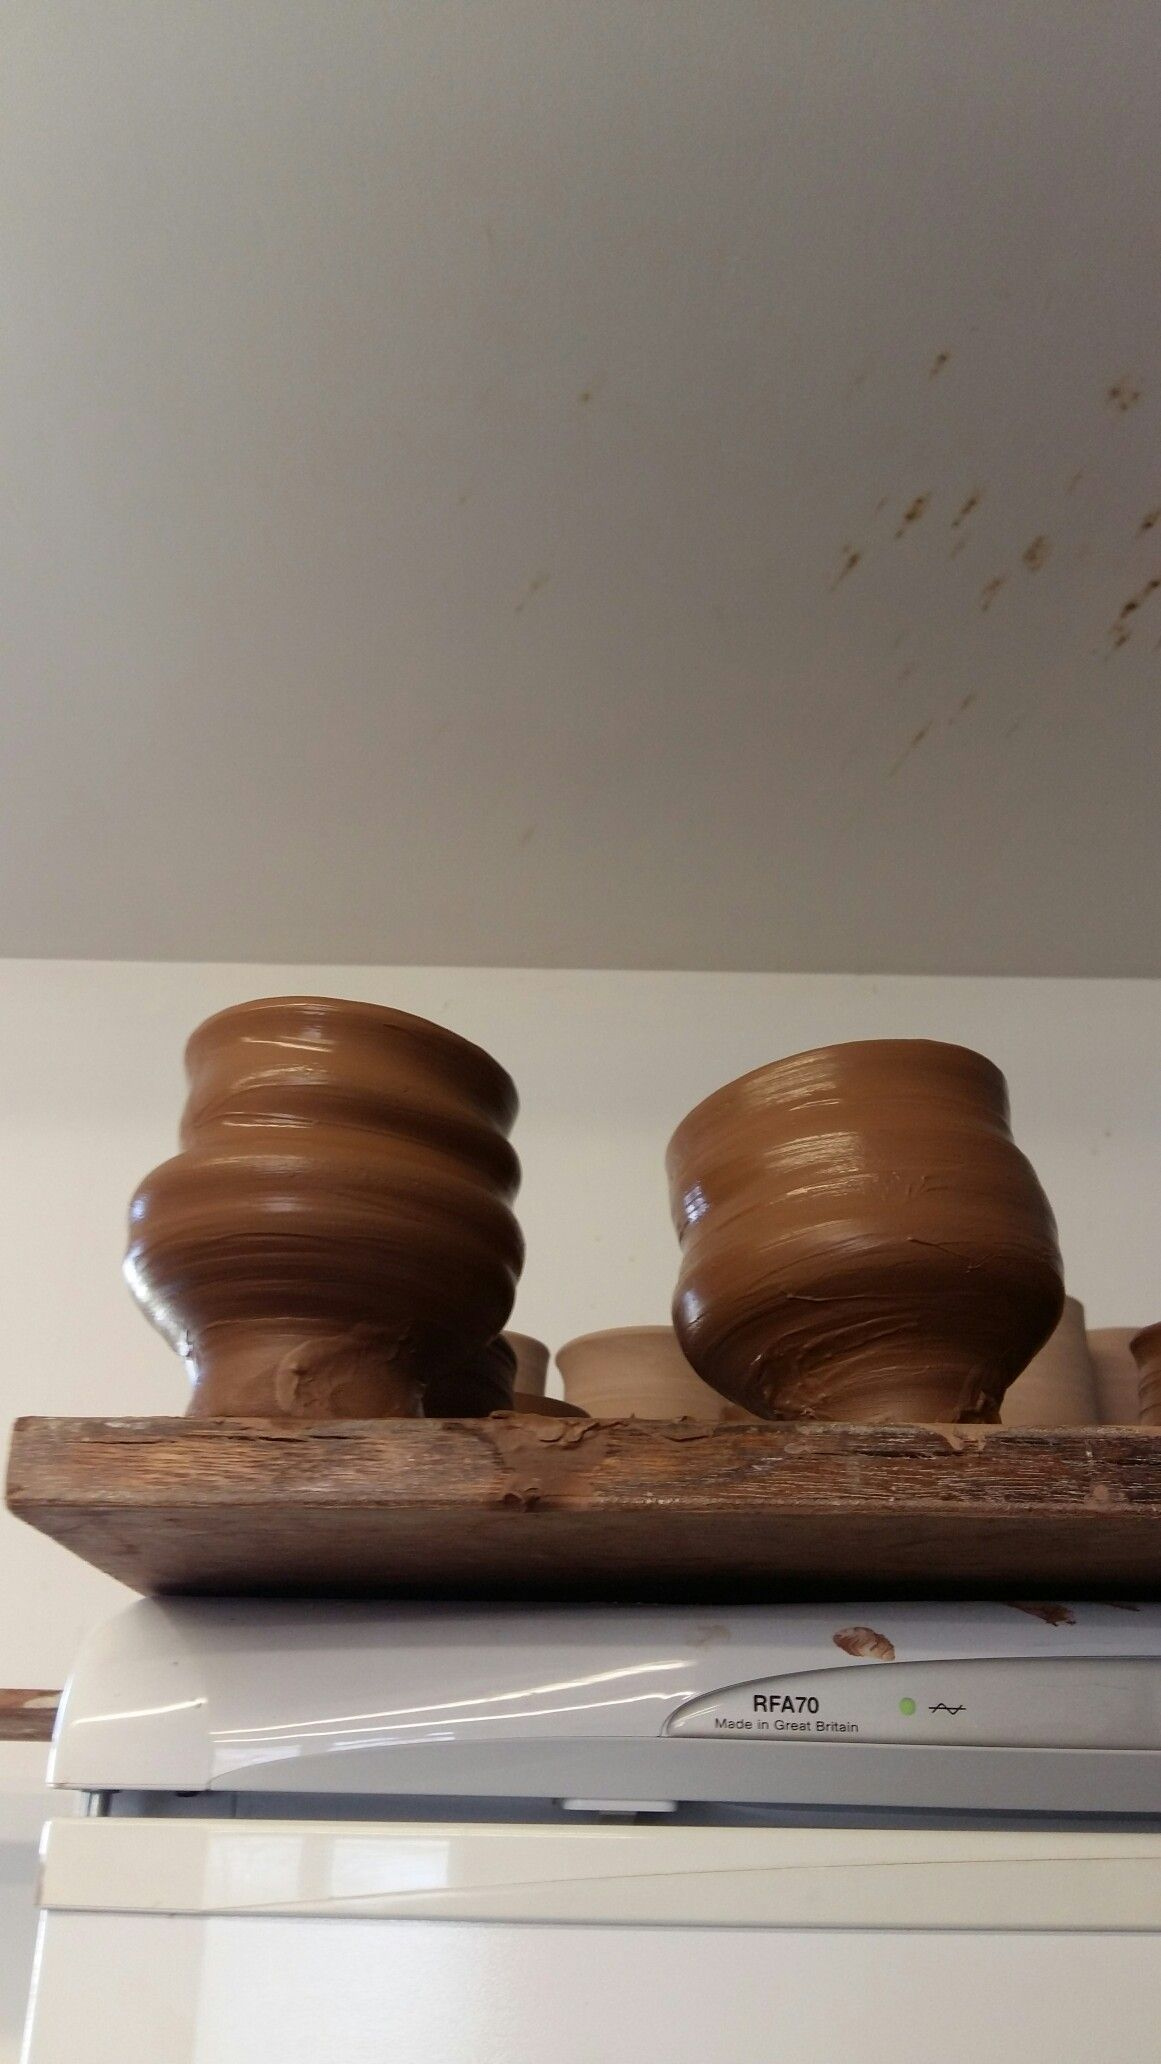 Wabi sabi tea bowls in progress by Johann Rohl